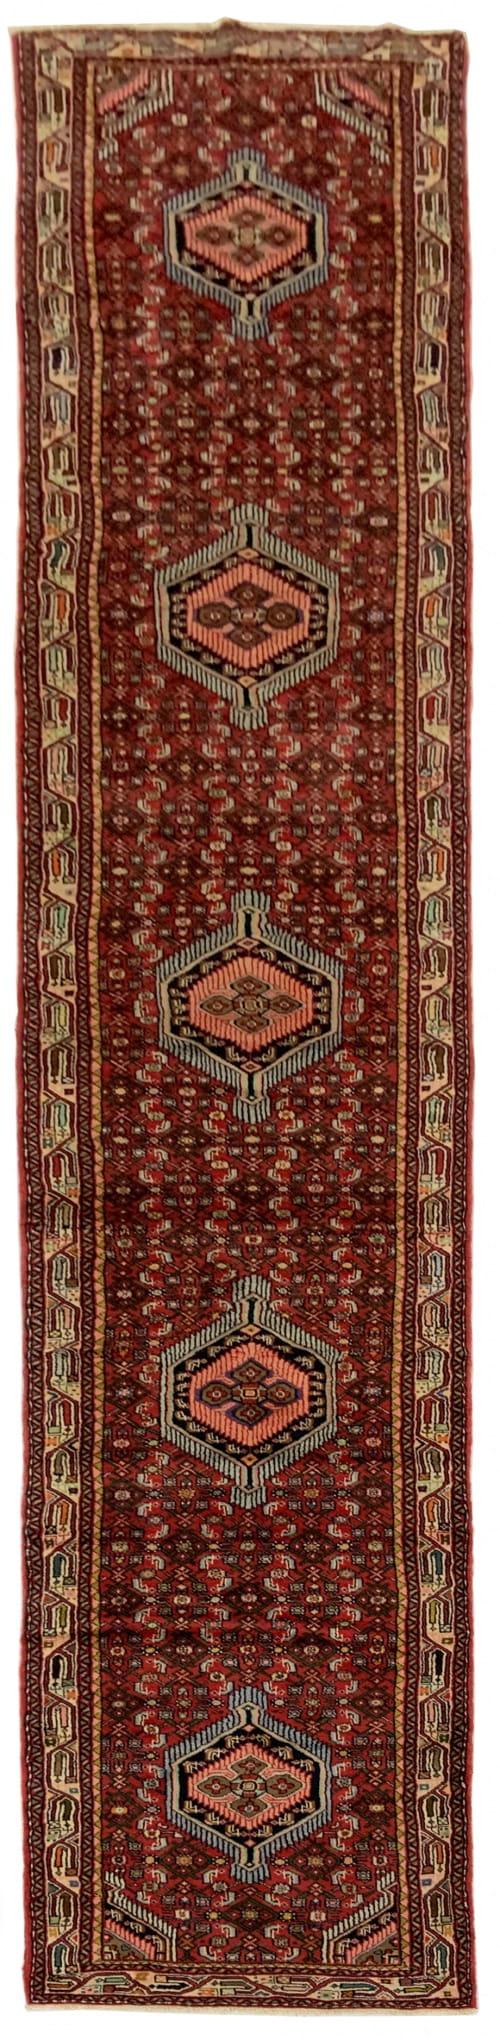 Lot# 43, Trible Enjelass-, circa 1970, Asadabad village, takpood weave, Persia, size 477x84 cm